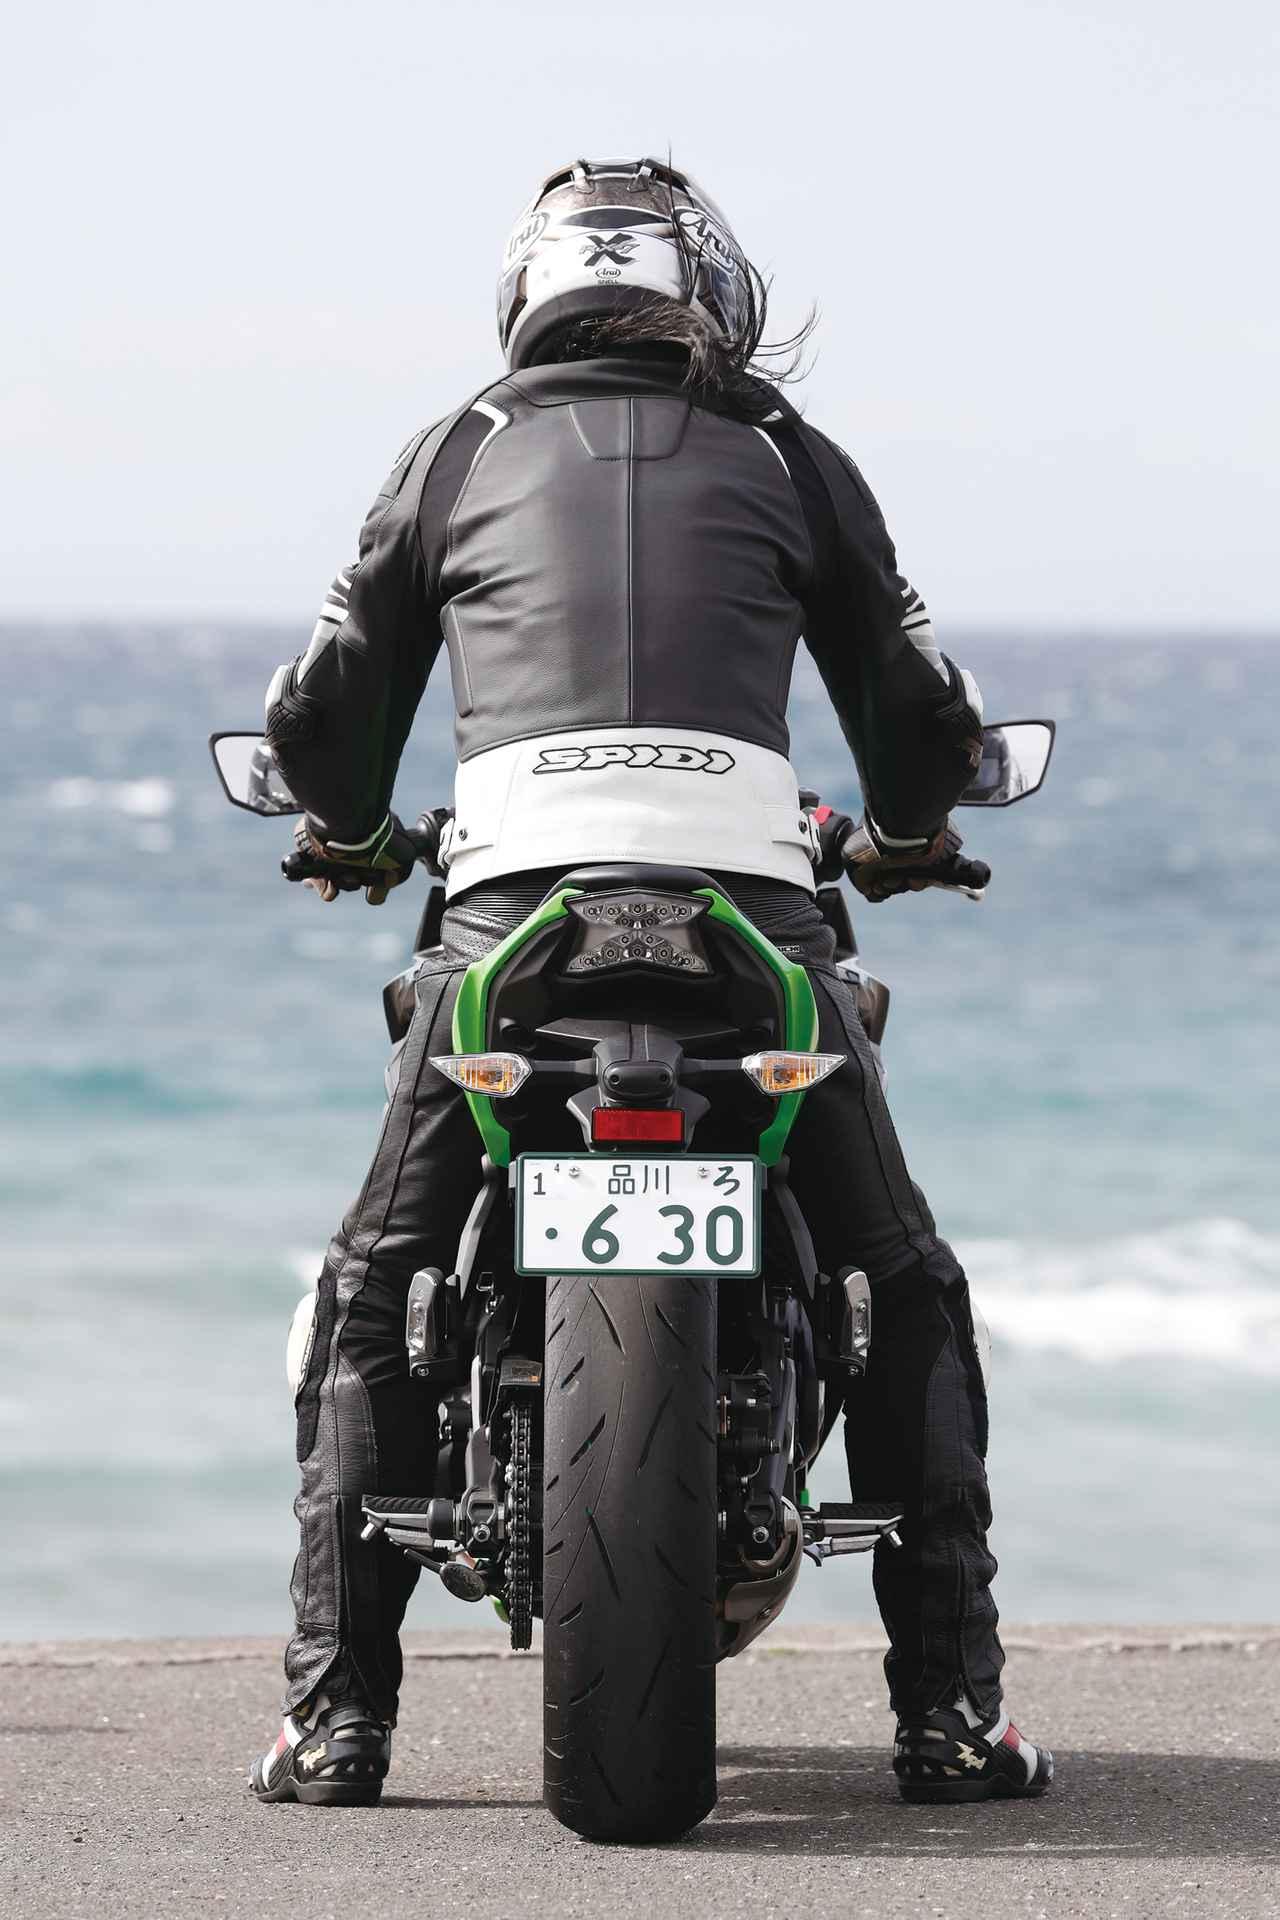 Images : 3番目の画像 - カワサキ「ニンジャ650 KRTエディション」の写真をまとめて見る! - webオートバイ